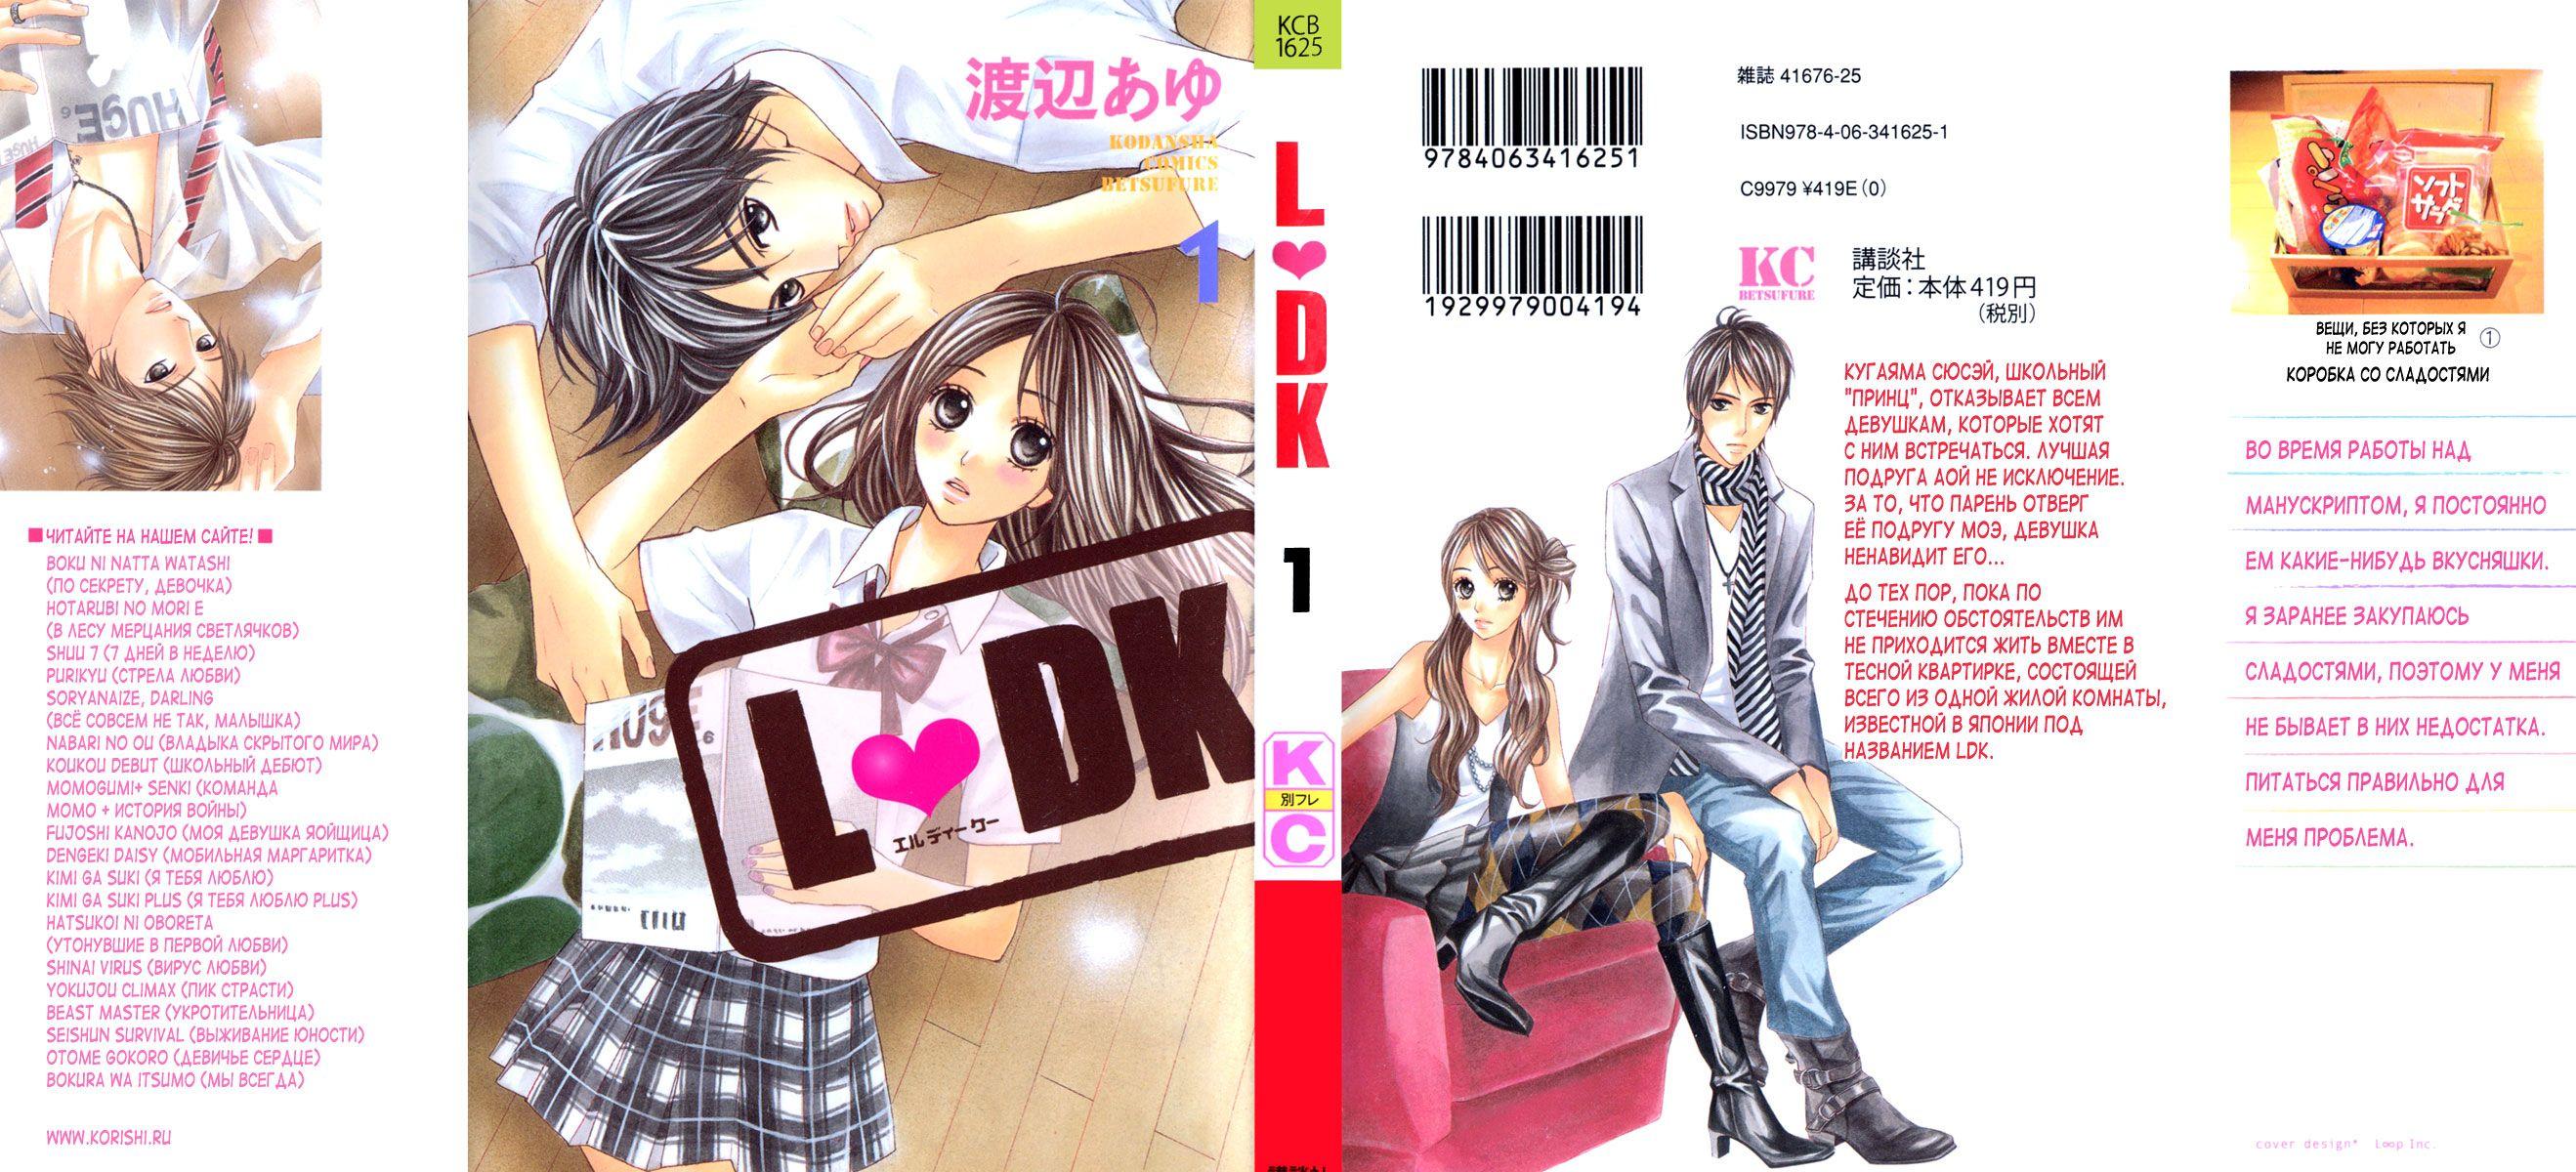 Читать мангу LDK / LDK / ЛДК глава 1_1 in 2020 Manga